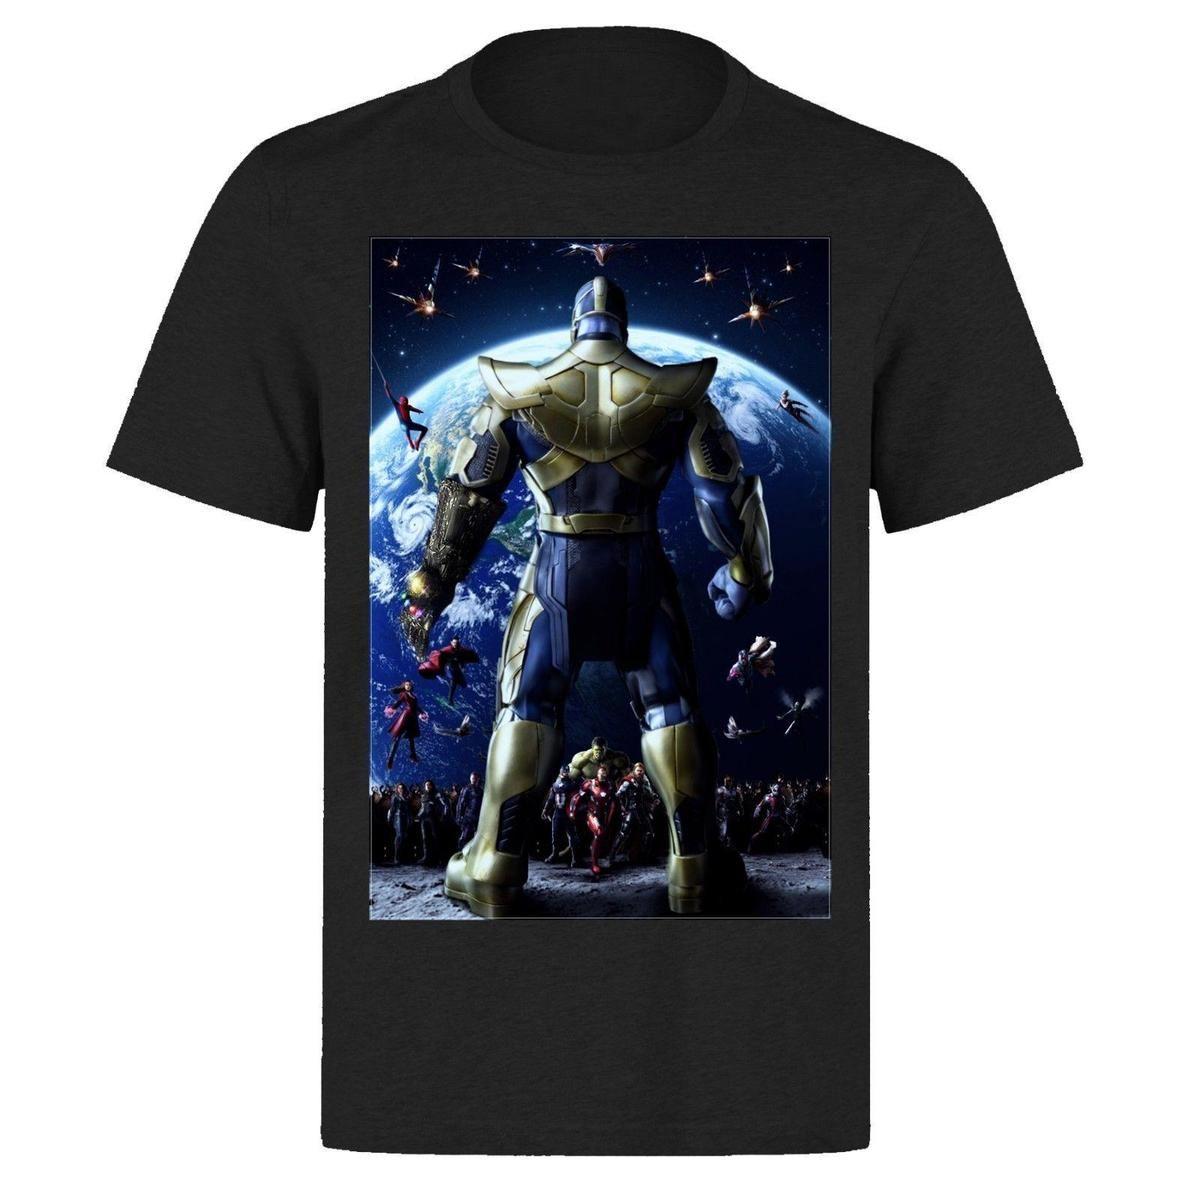 7a24a674b7 Mens Designer T Shirts Shirt THANOS VS THE WORLD AVENGERS INFINITY WAR PART  1 TONY STARK PH281 T SHIRT Design Your T Shirt Personalized T Shirt From ...